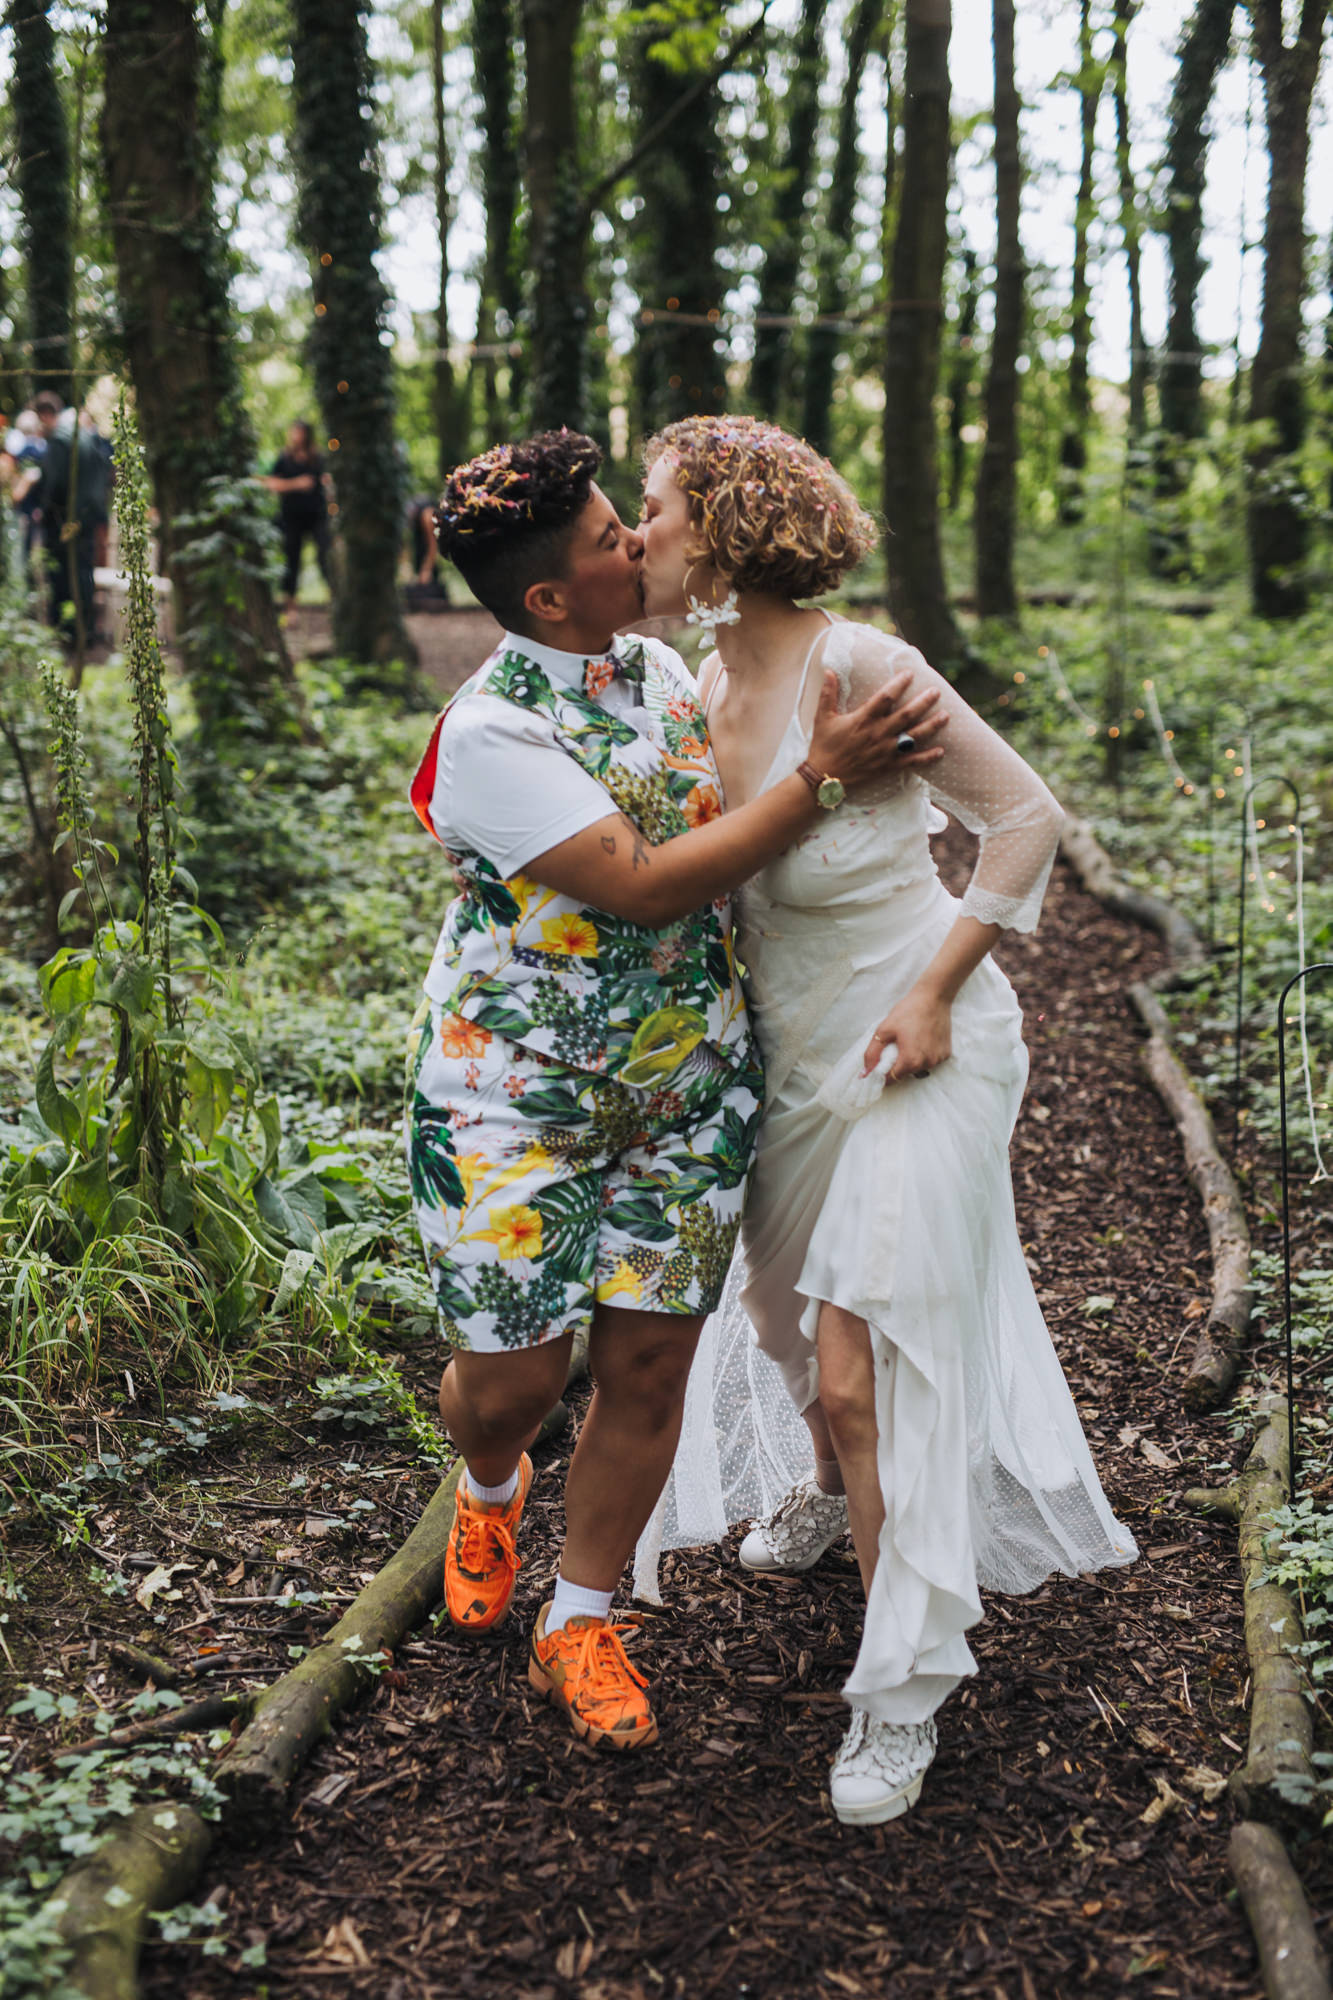 applewood wedding photographer leeds, yorkshire40.jpg